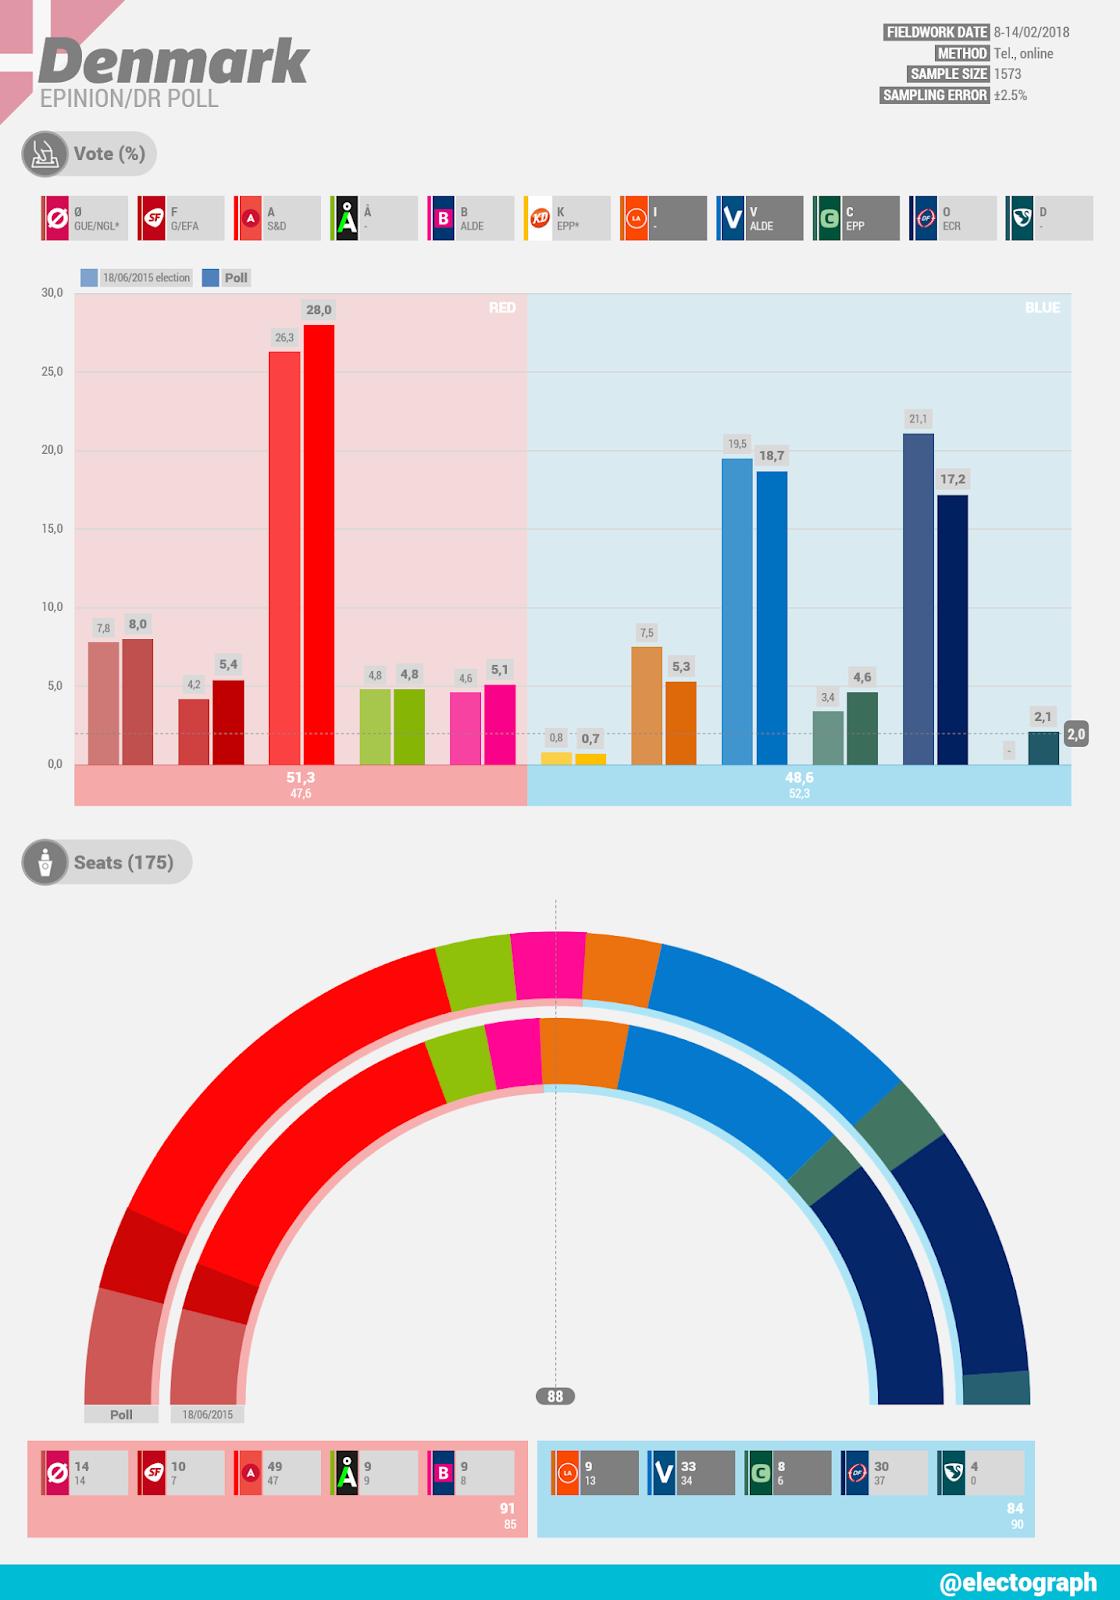 DENMARK Epinion poll chart for DR, February 2018